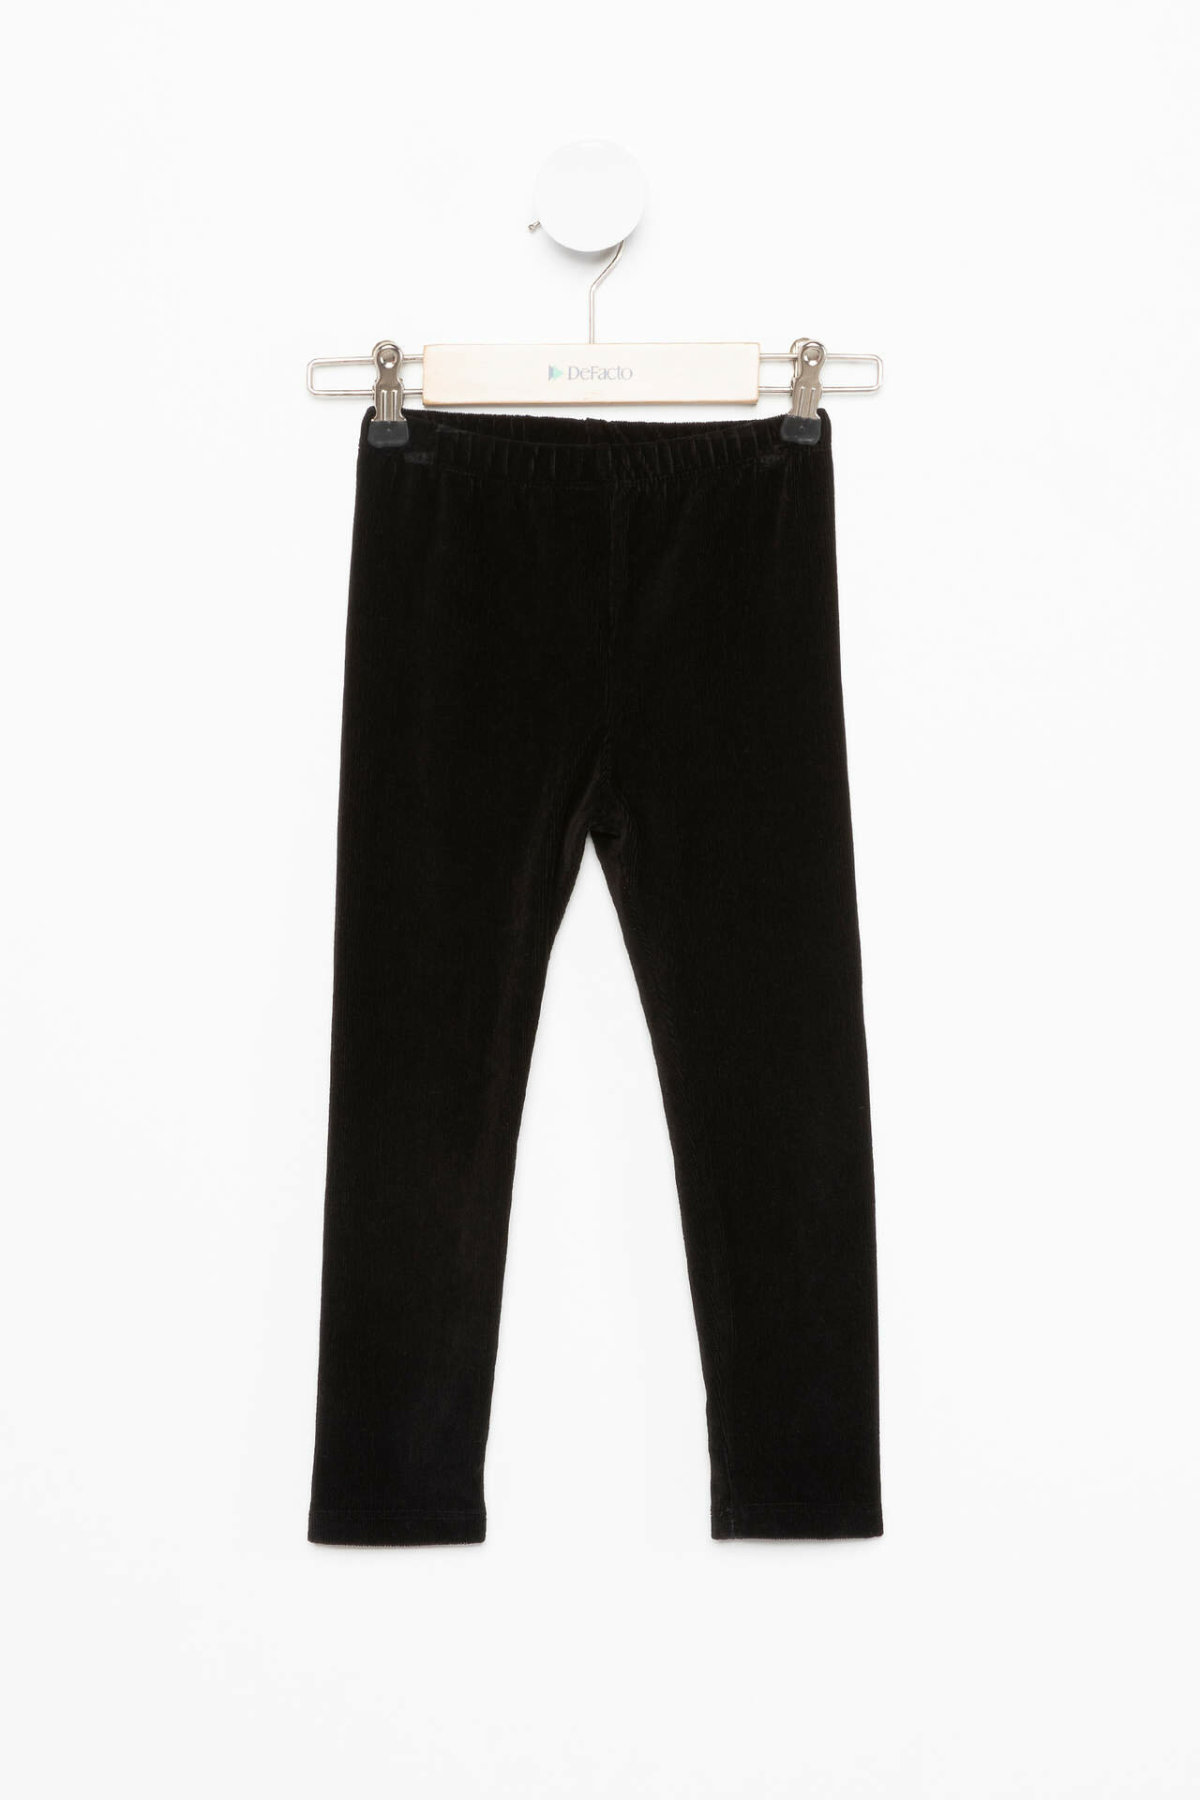 DeFacto Fashion BabyGirl Leggings Casual Kids High Quality Long Pants High Elastic Sweatpants New - K0686A218AU